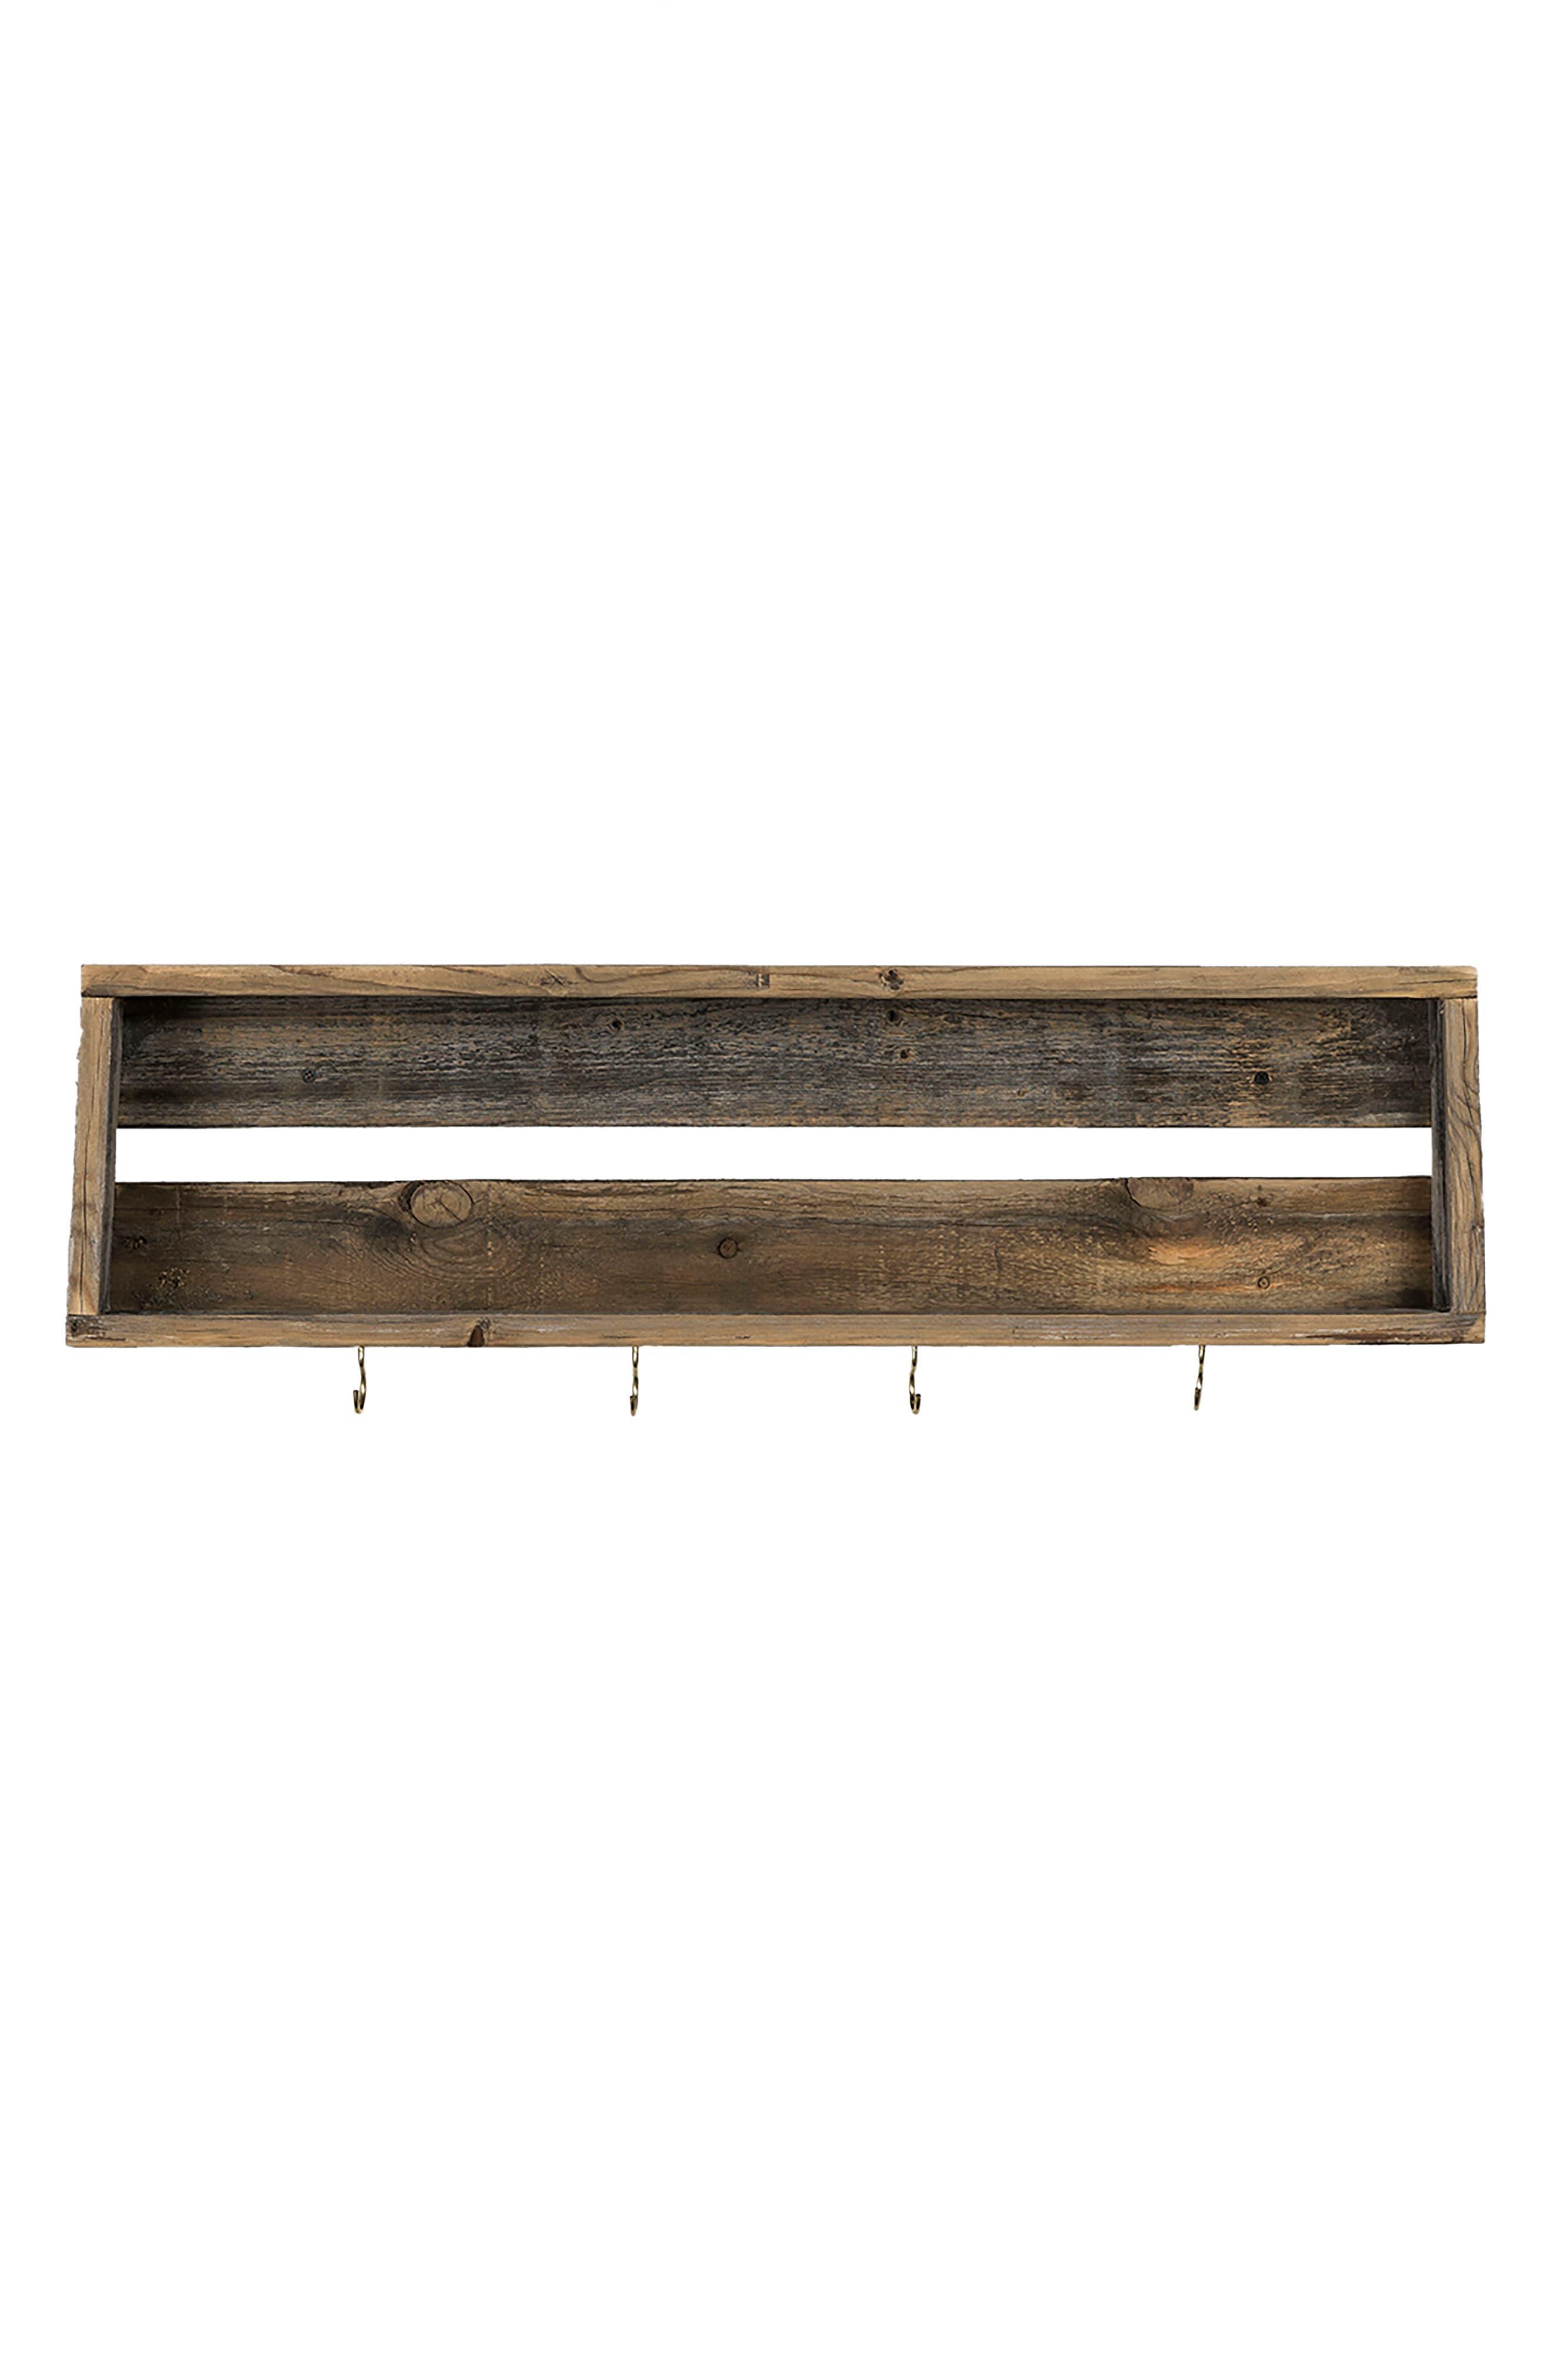 Repurposed Wood Shelf with Hooks,                             Main thumbnail 1, color,                             200